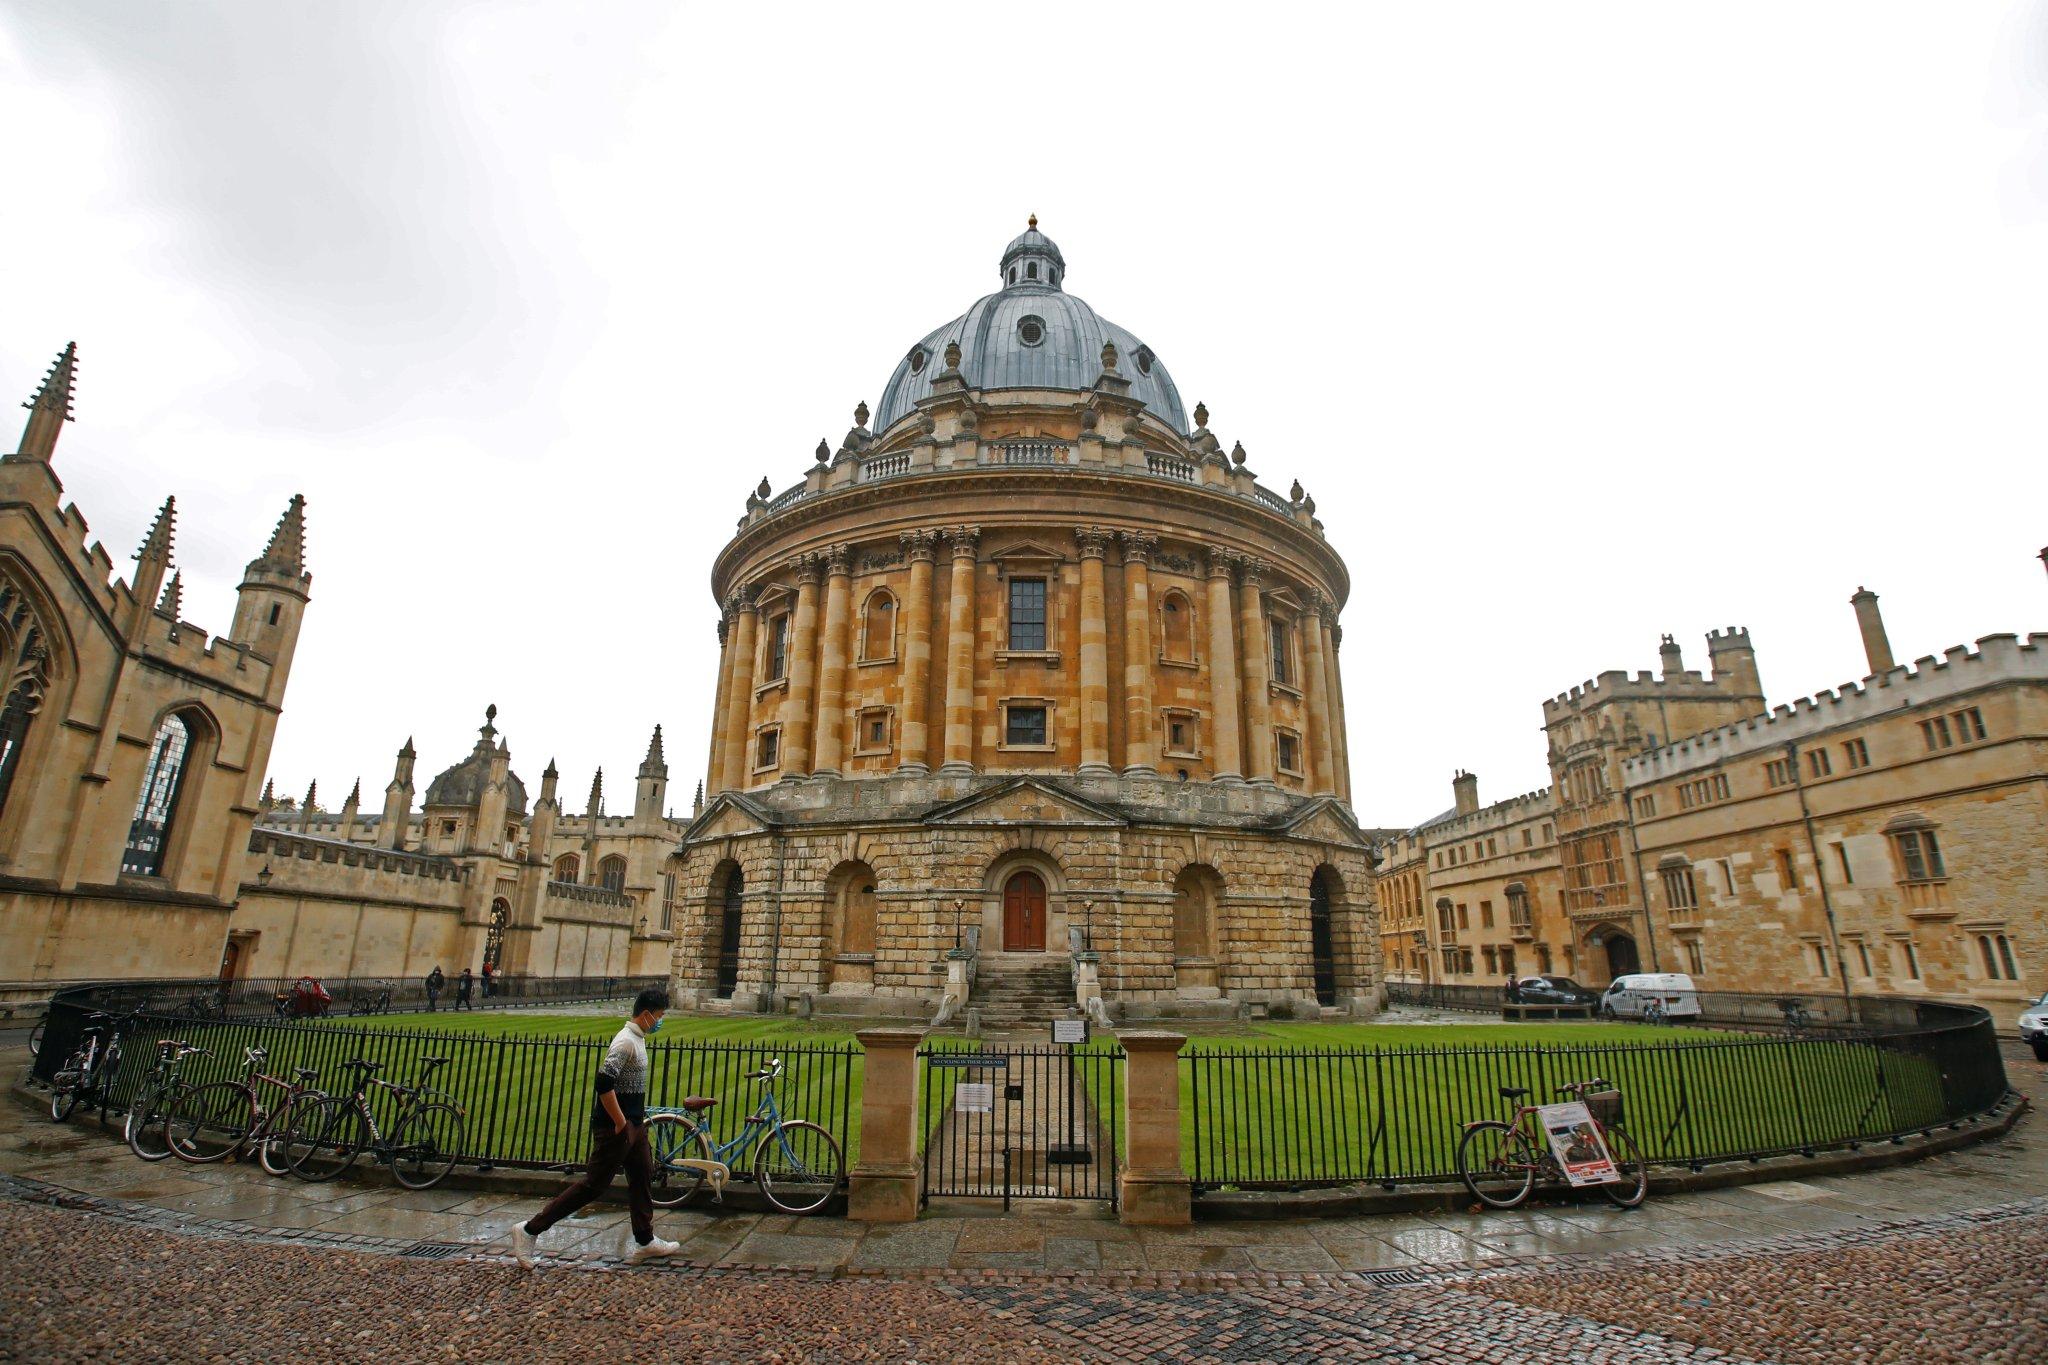 Oxford scientists develop five-minute COVID-19 antigen test